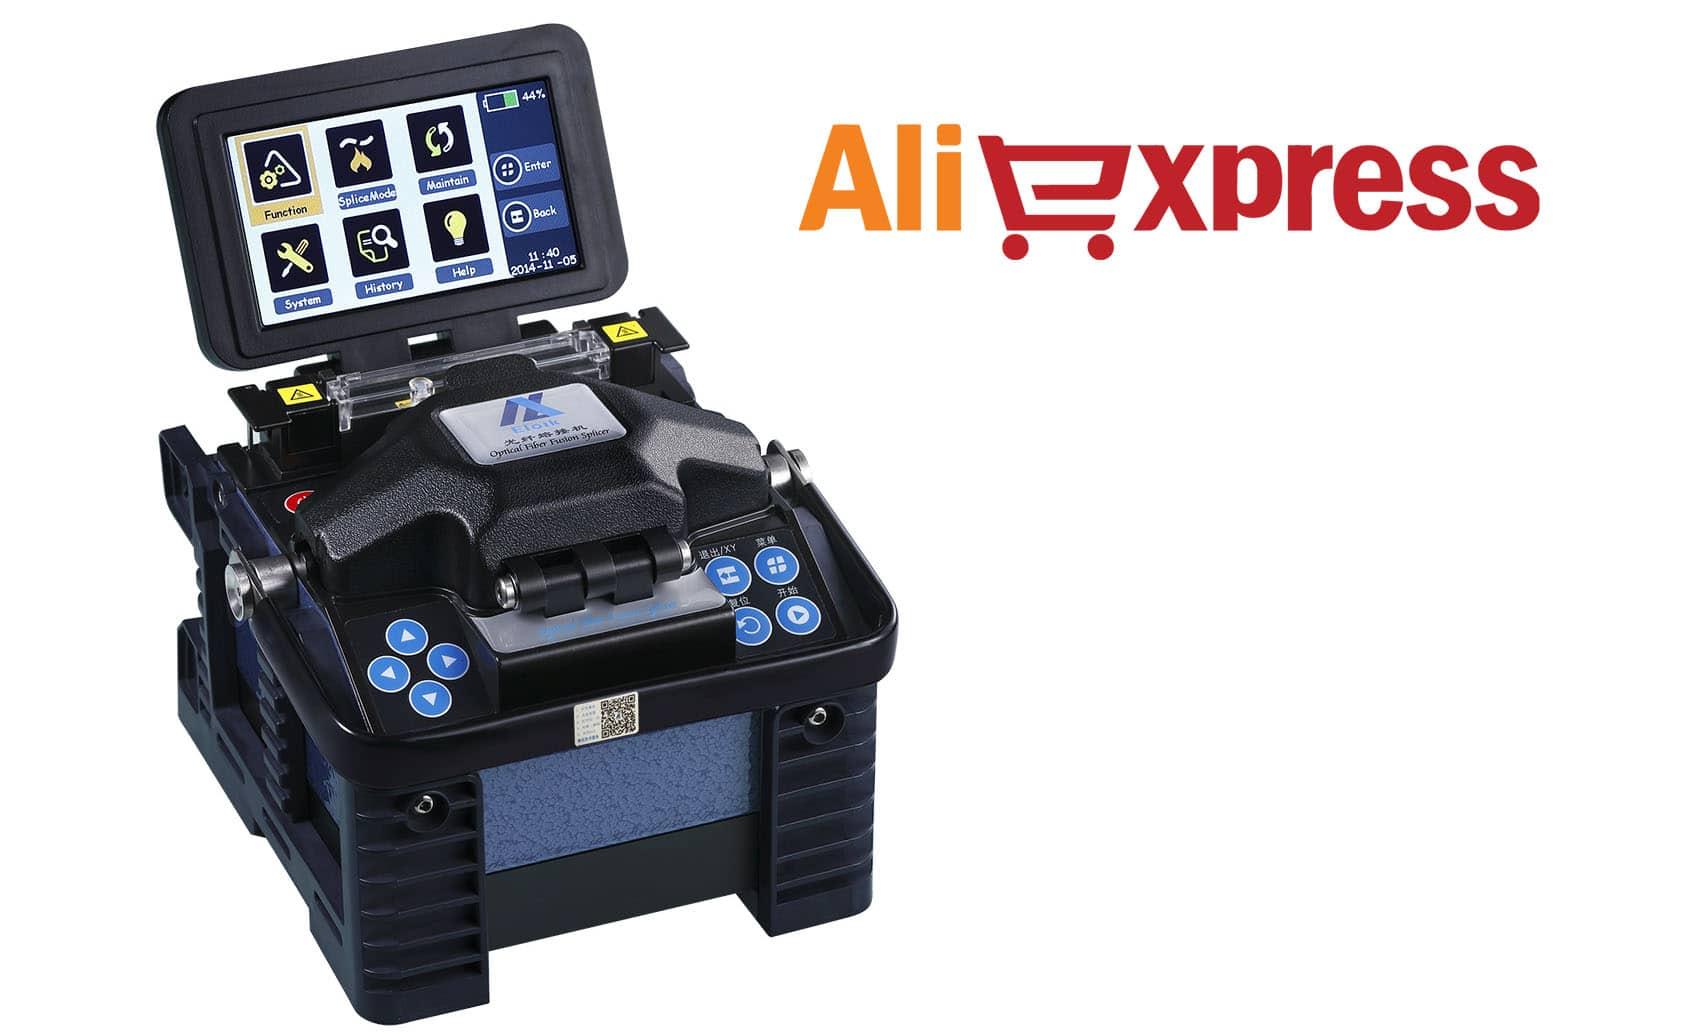 Máquinas fusionadeiras de fibra óptica BARATAS no AliExpress